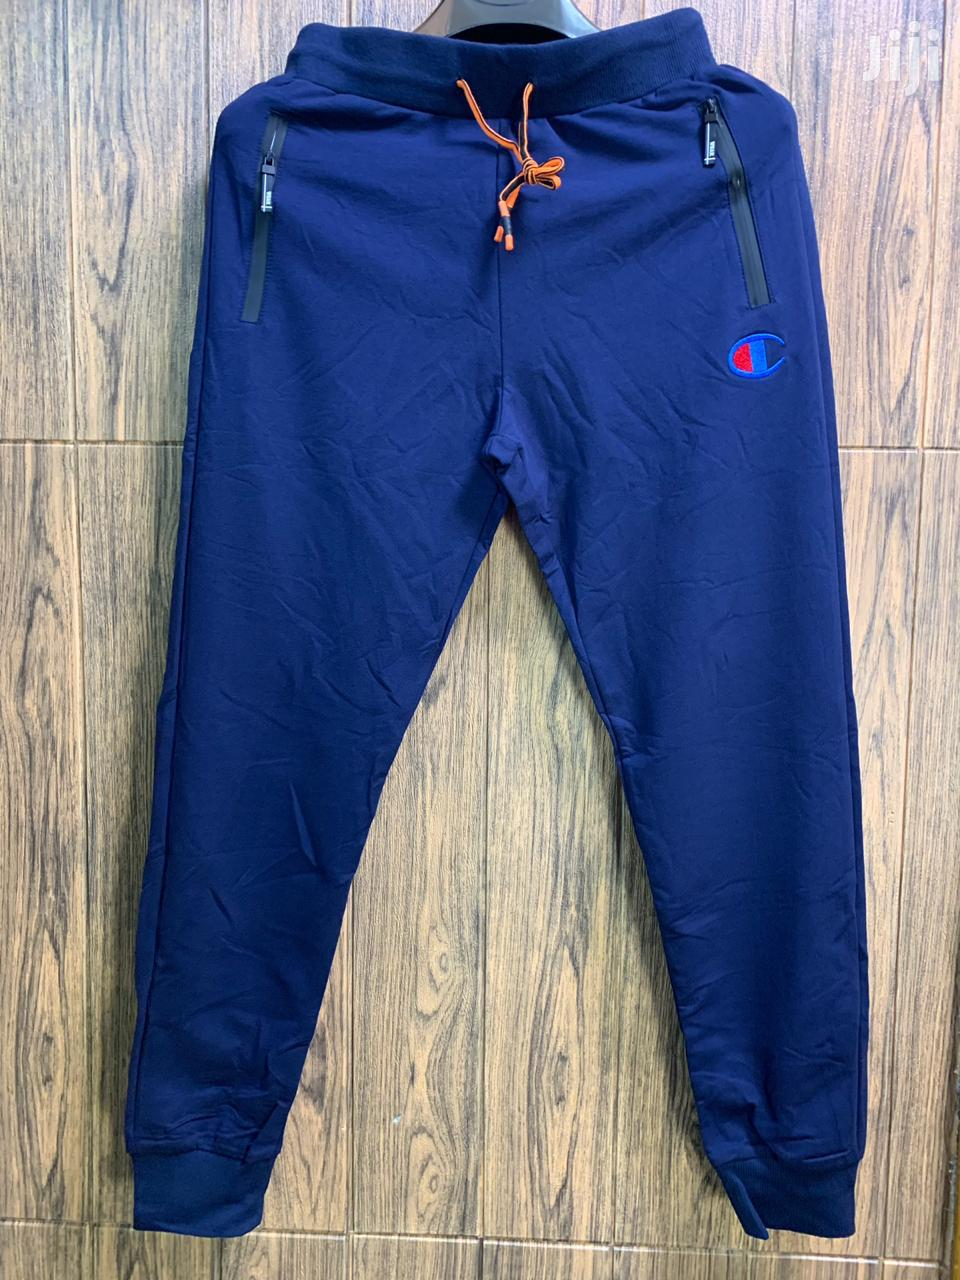 Sweatpants | Clothing for sale in Nairobi Central, Nairobi, Kenya